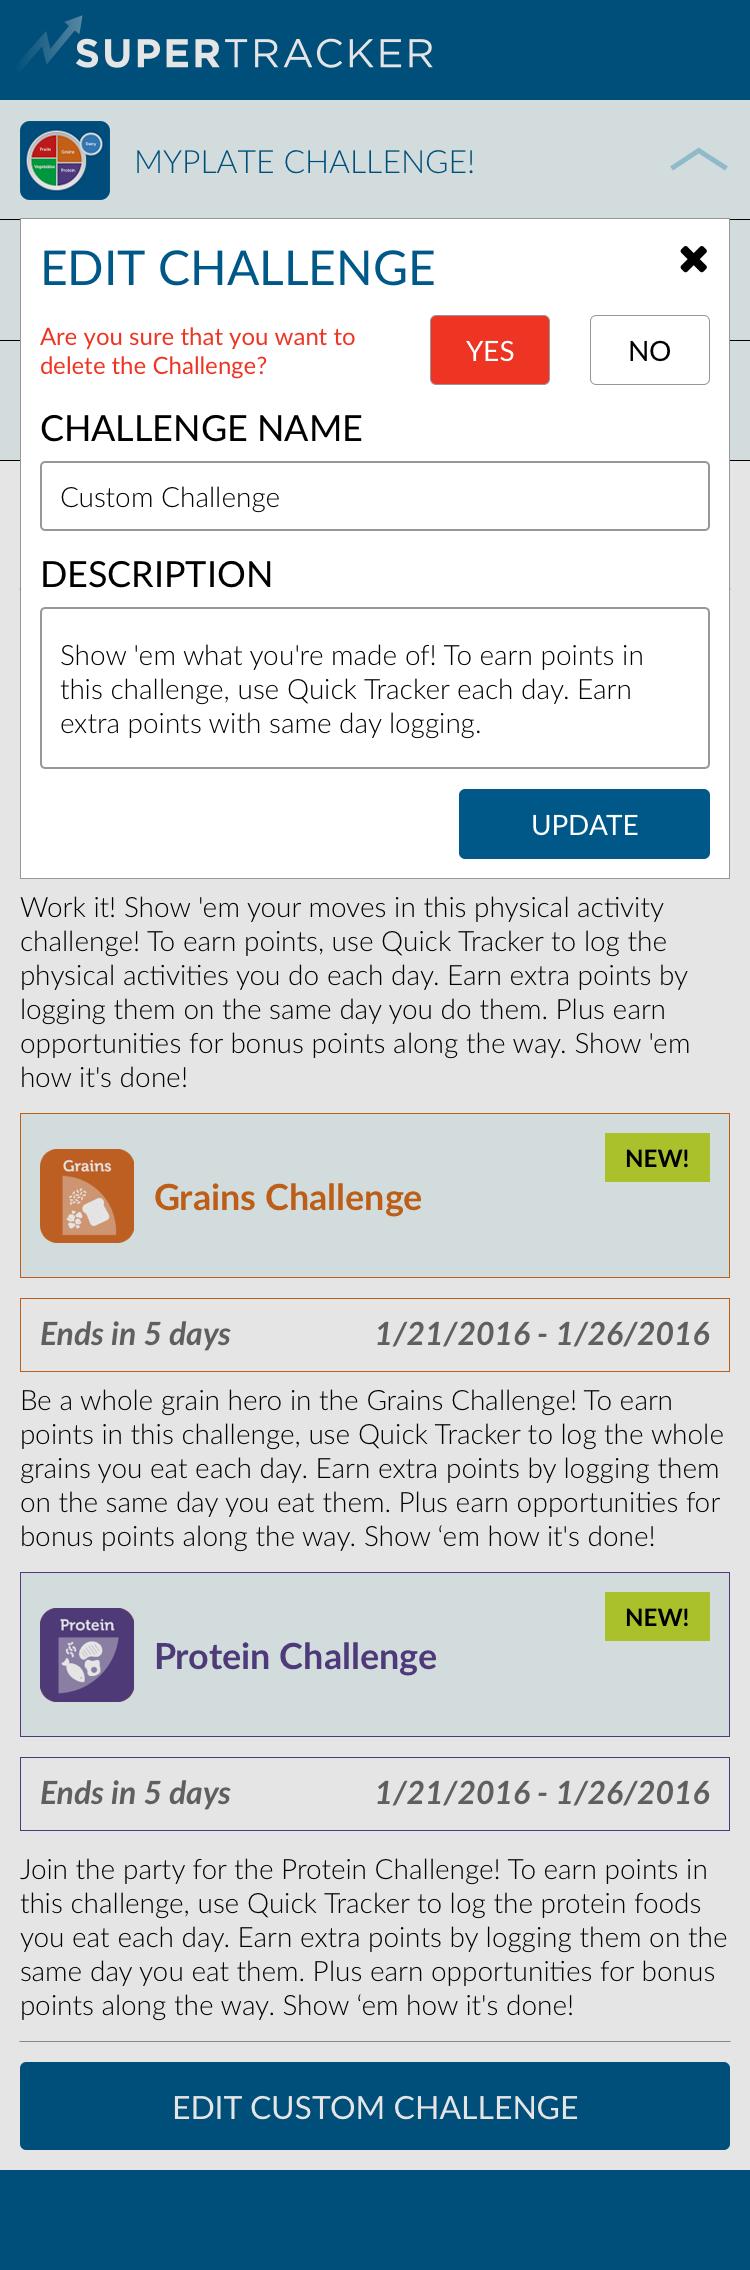 Custom - Main Group > Edit Challenge - Delete